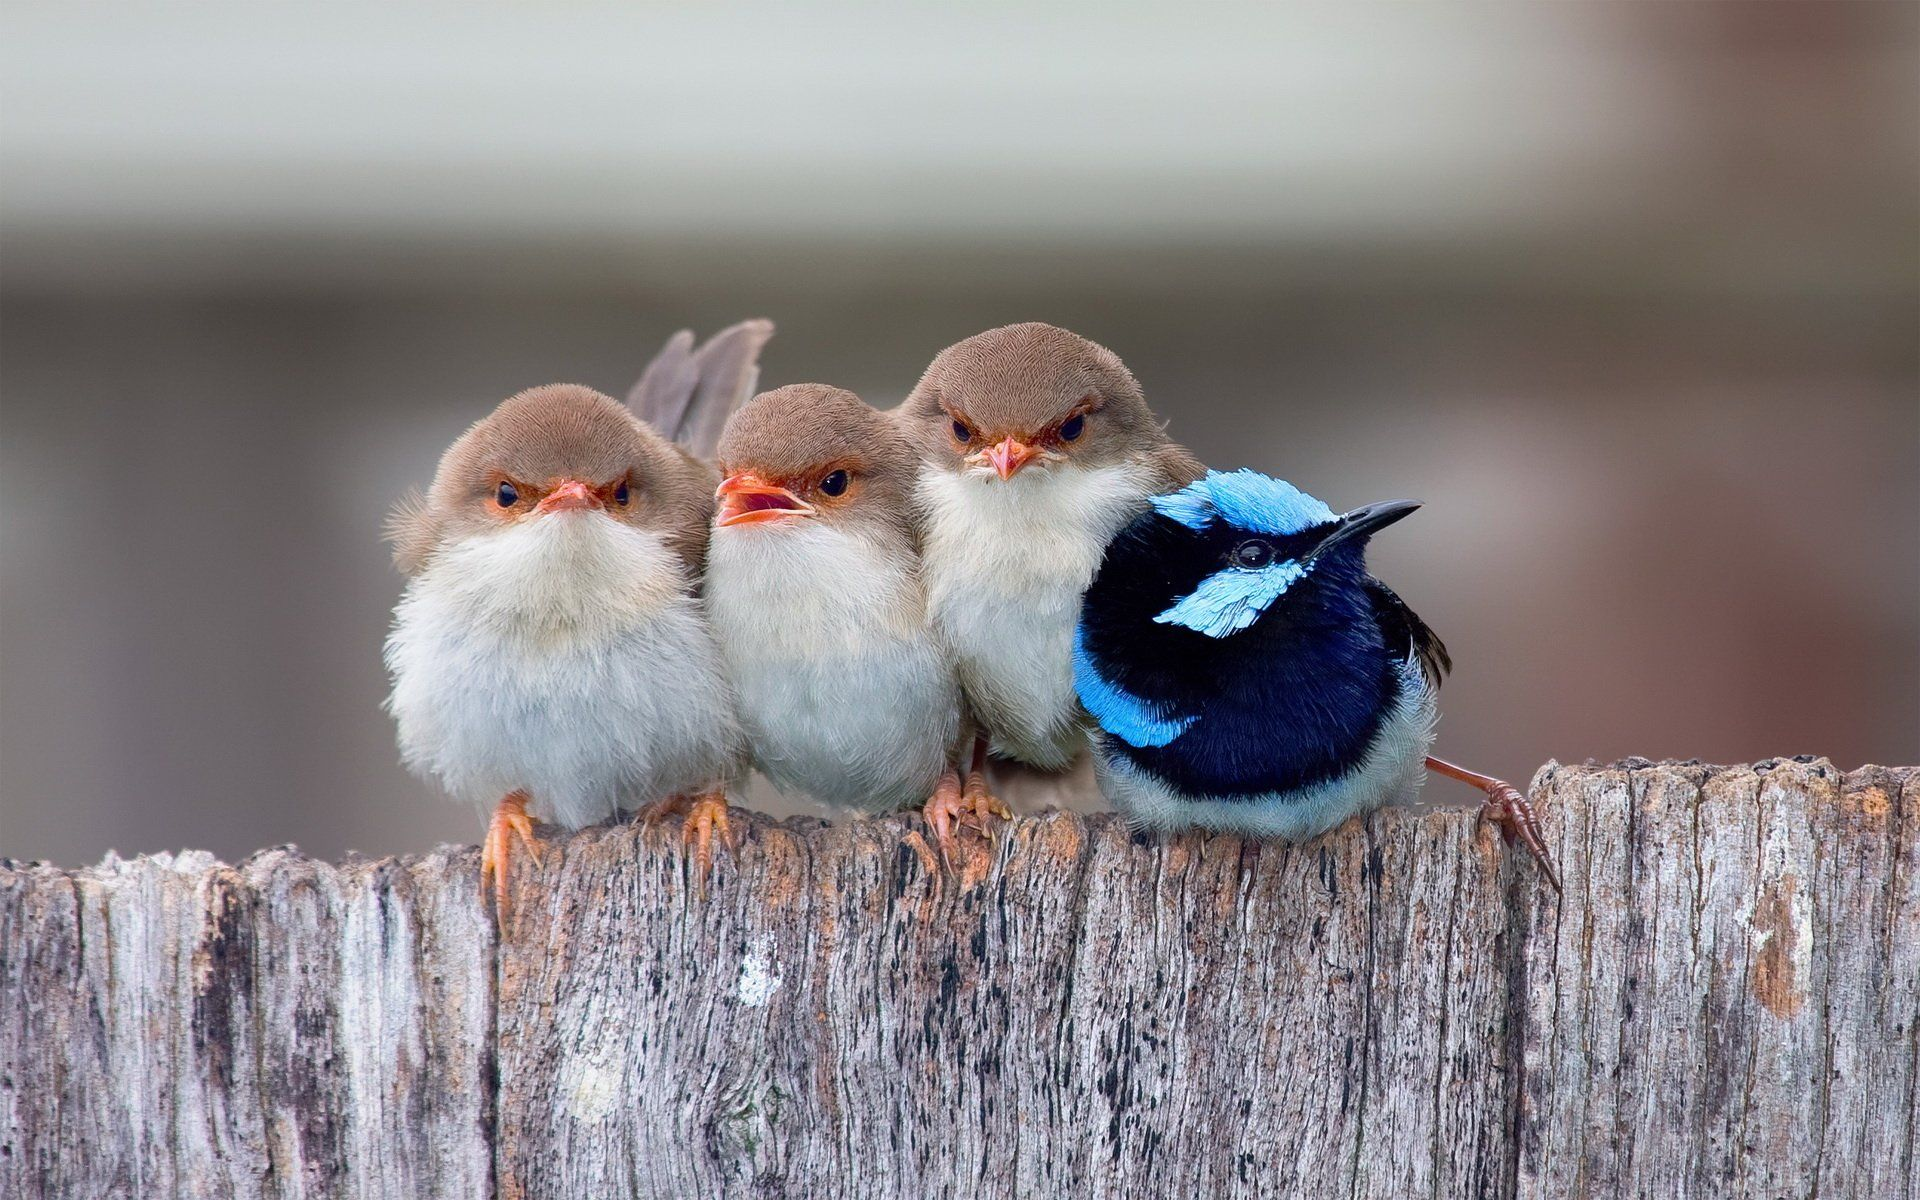 Bird Computer Wallpapers Desktop Backgrounds 1920x1200 Id 556063 Funny Birds Little Birds Cute Birds